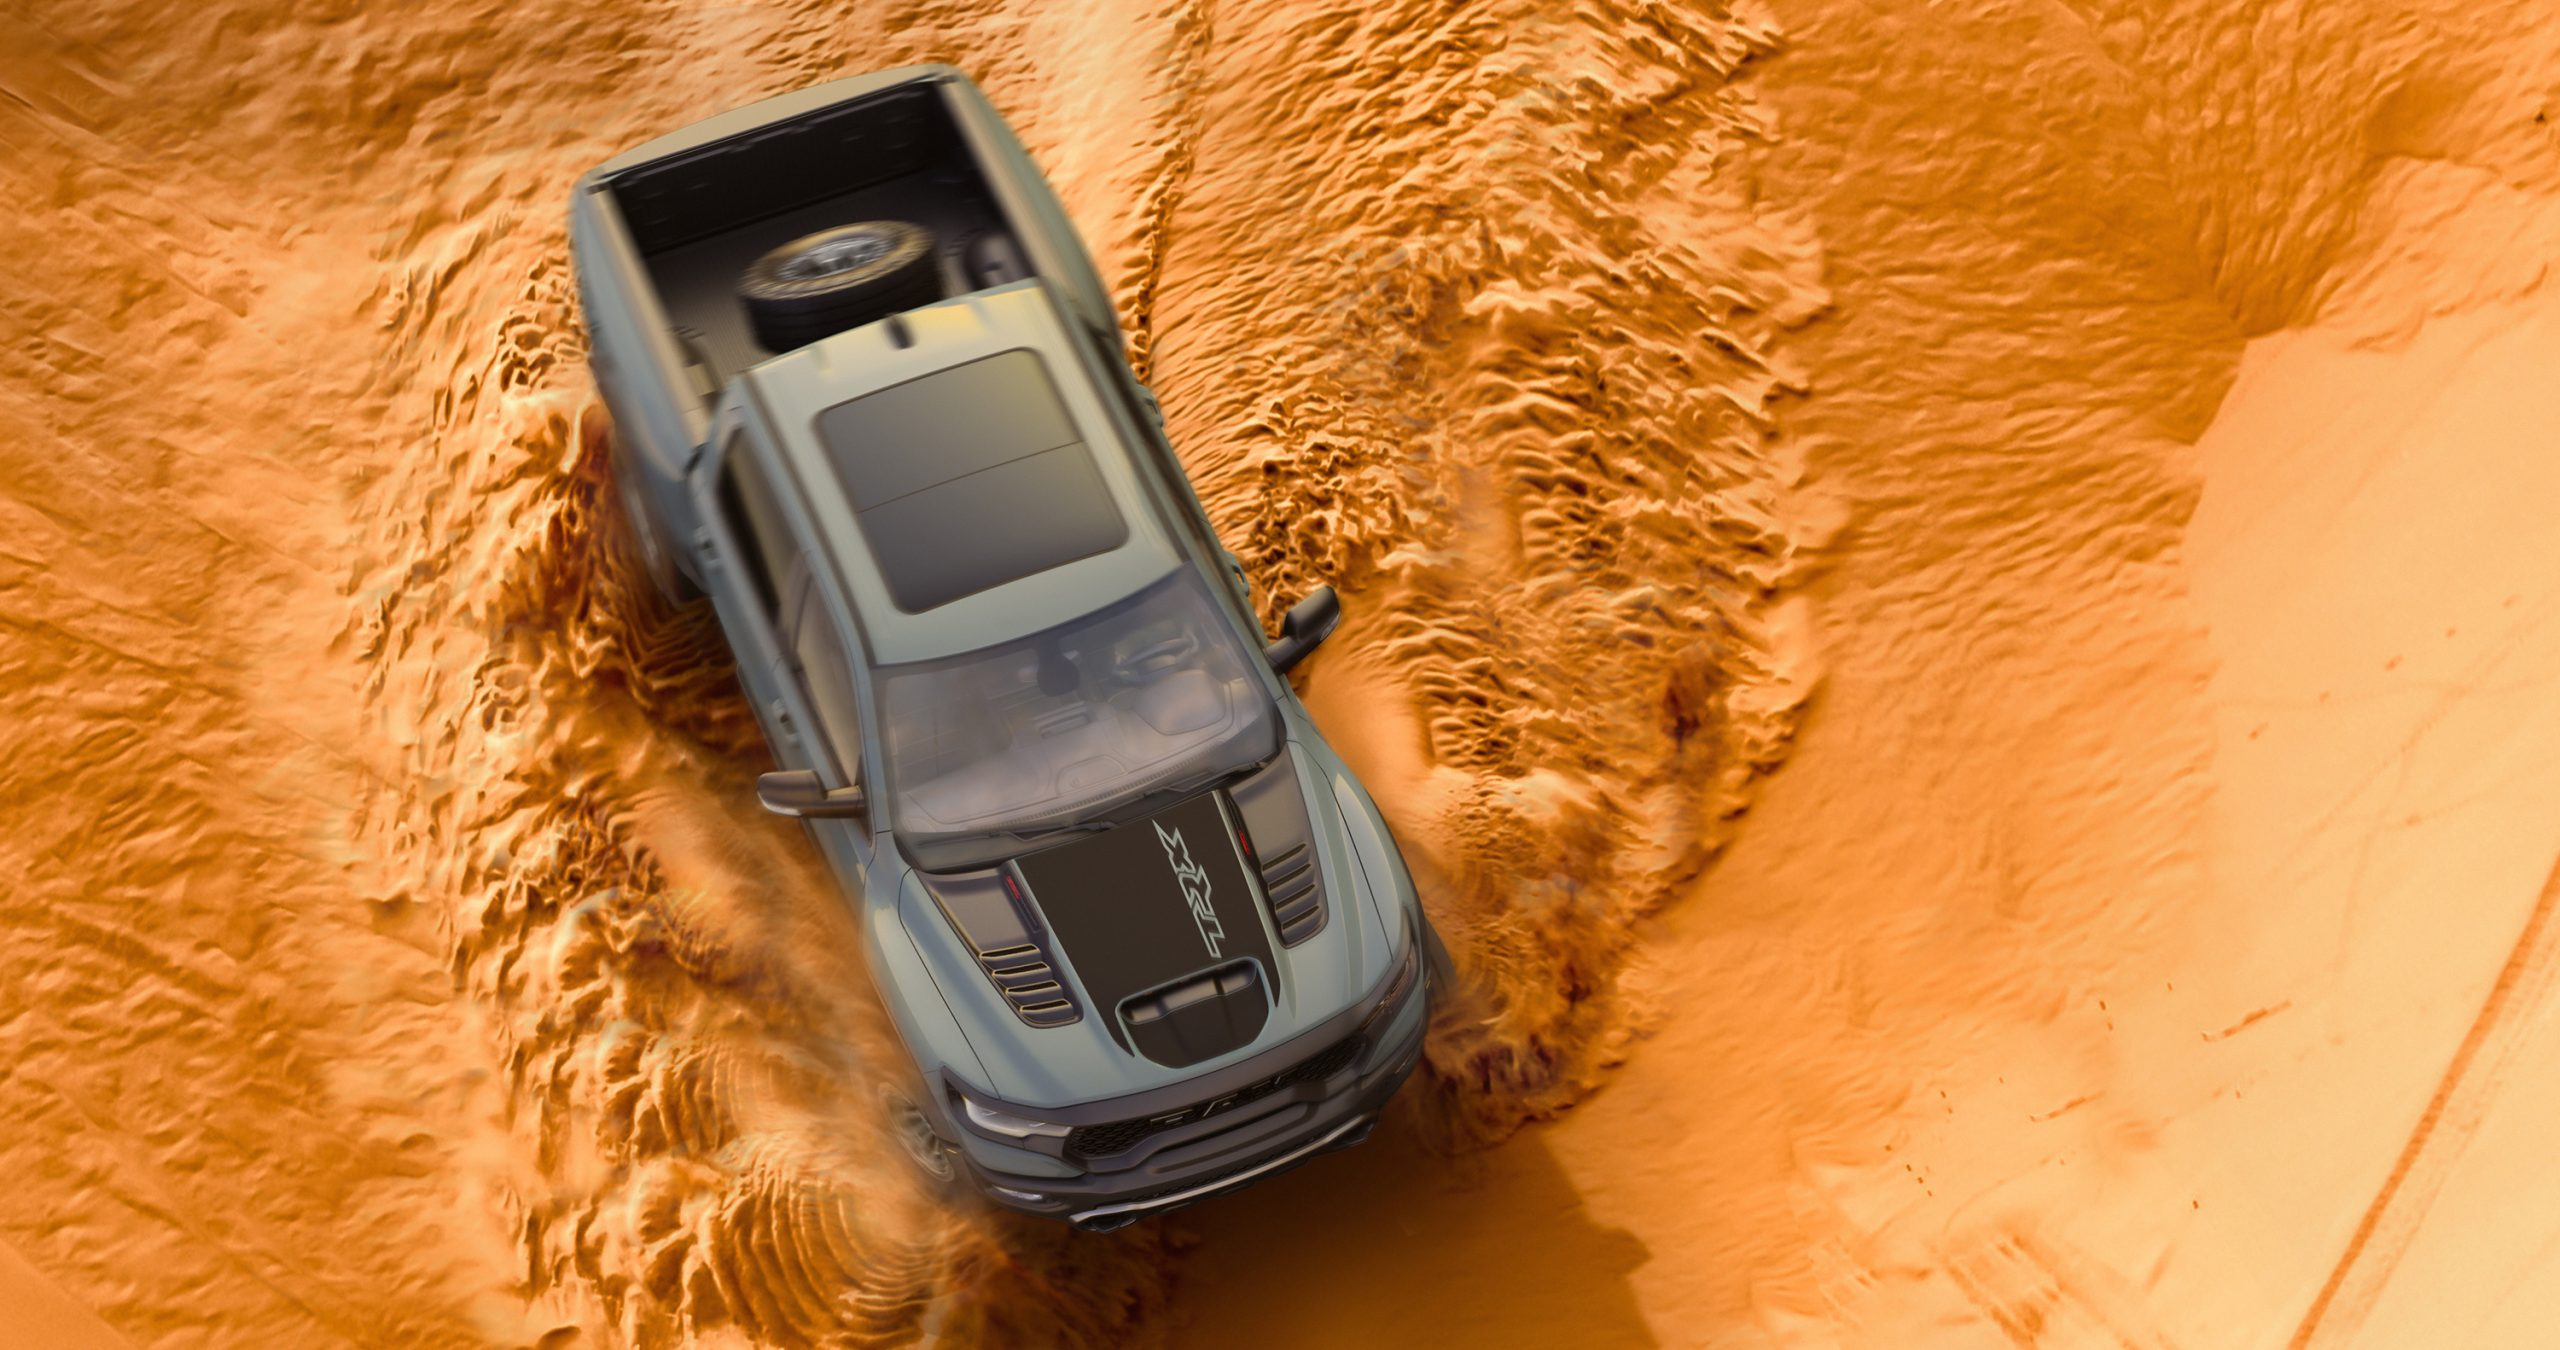 2021 Ram 1500 TRX Launch Edition sand dune front 3/4